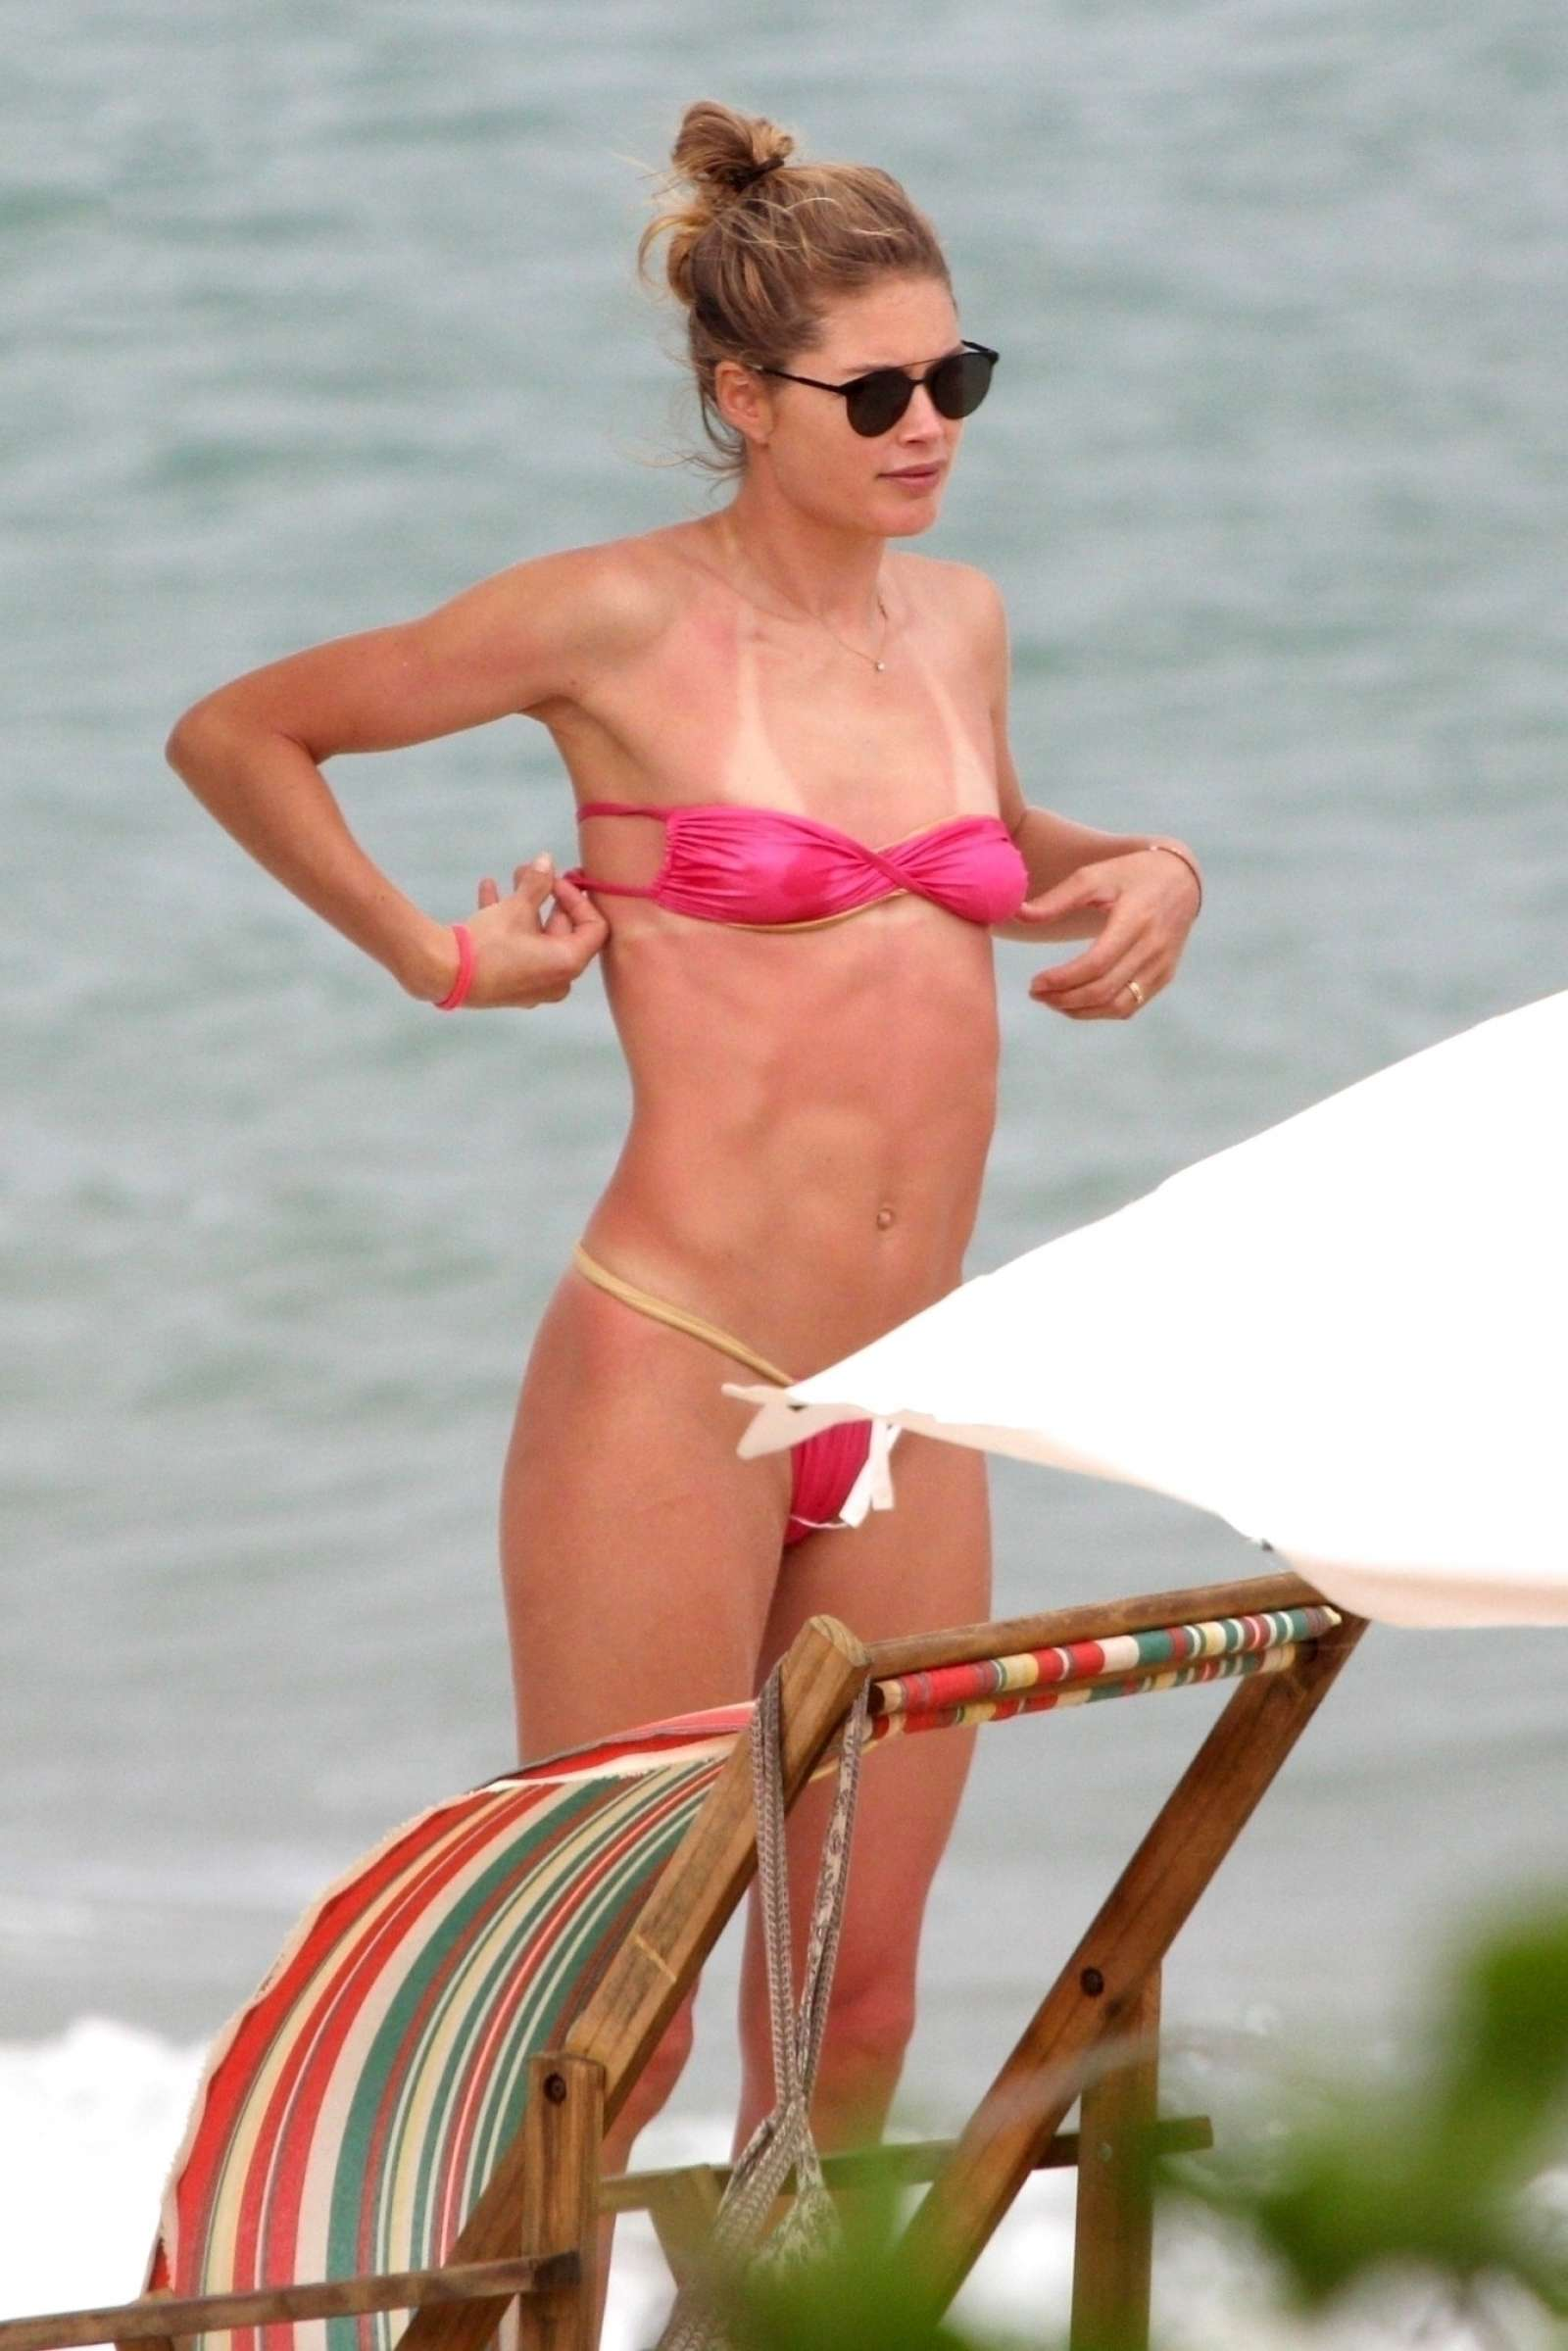 Doutzen Kroes in Bikini on the beach in Bahia Pic 1 of 35